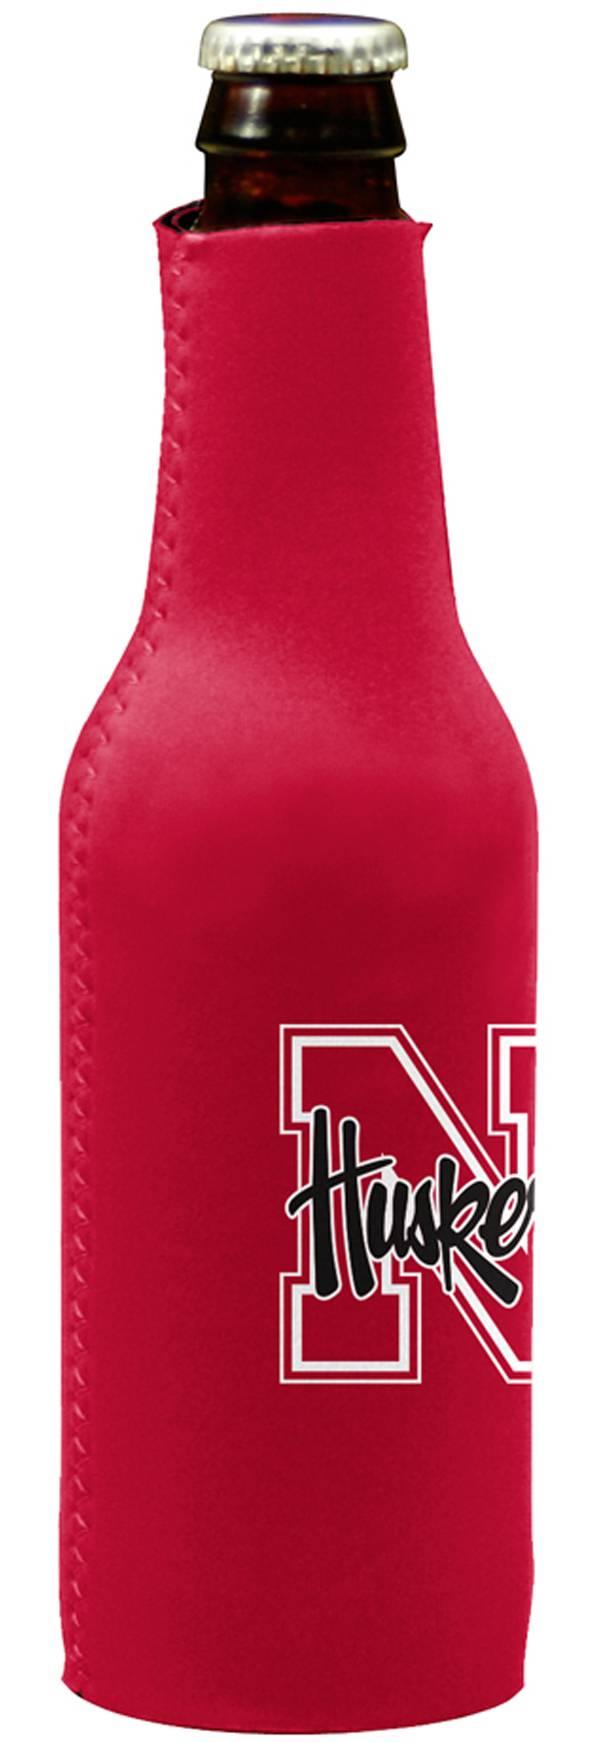 Nebraska Cornhuskers Bottle Koozie product image